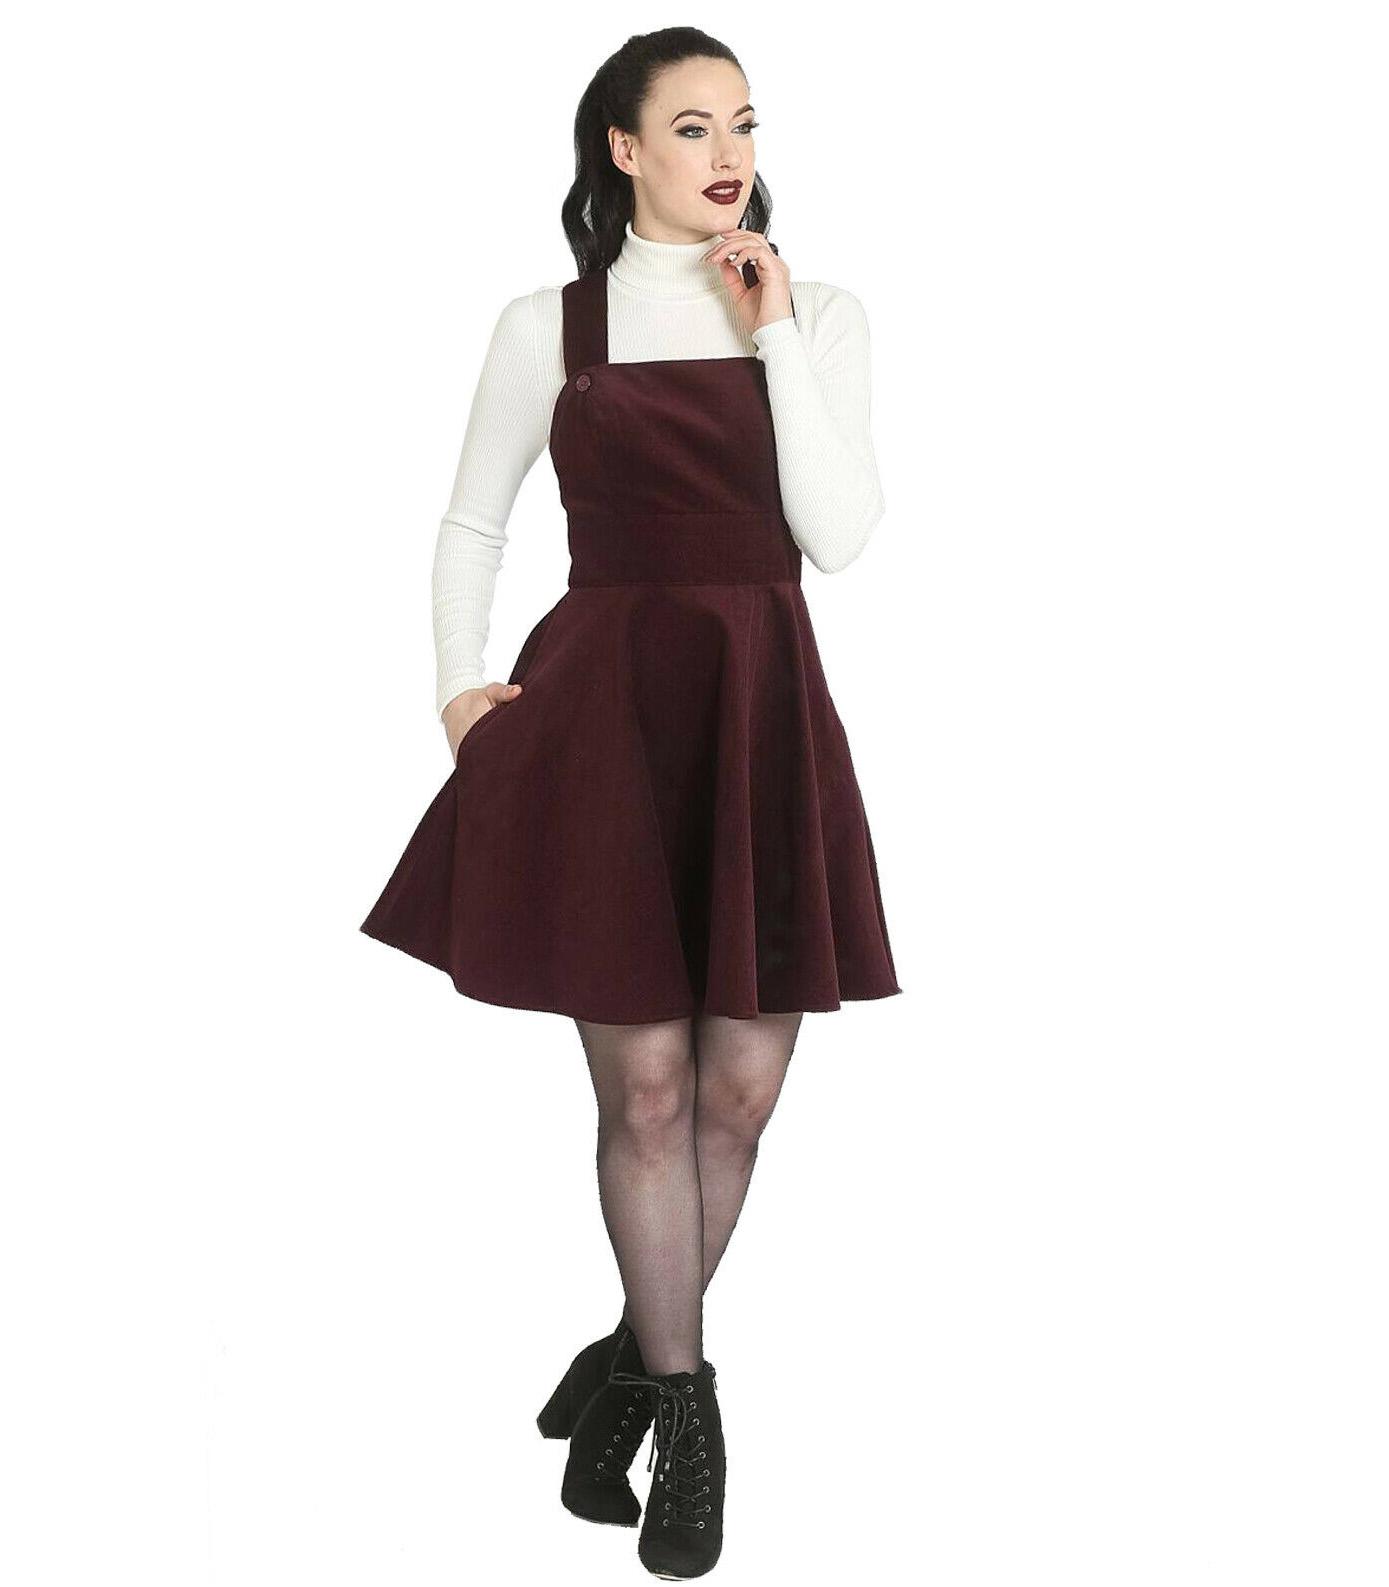 Hell-Bunny-Rockabilly-Corduroy-Mini-Dress-WONDER-YEARS-Pinafore-Wine-All-Sizes thumbnail 3